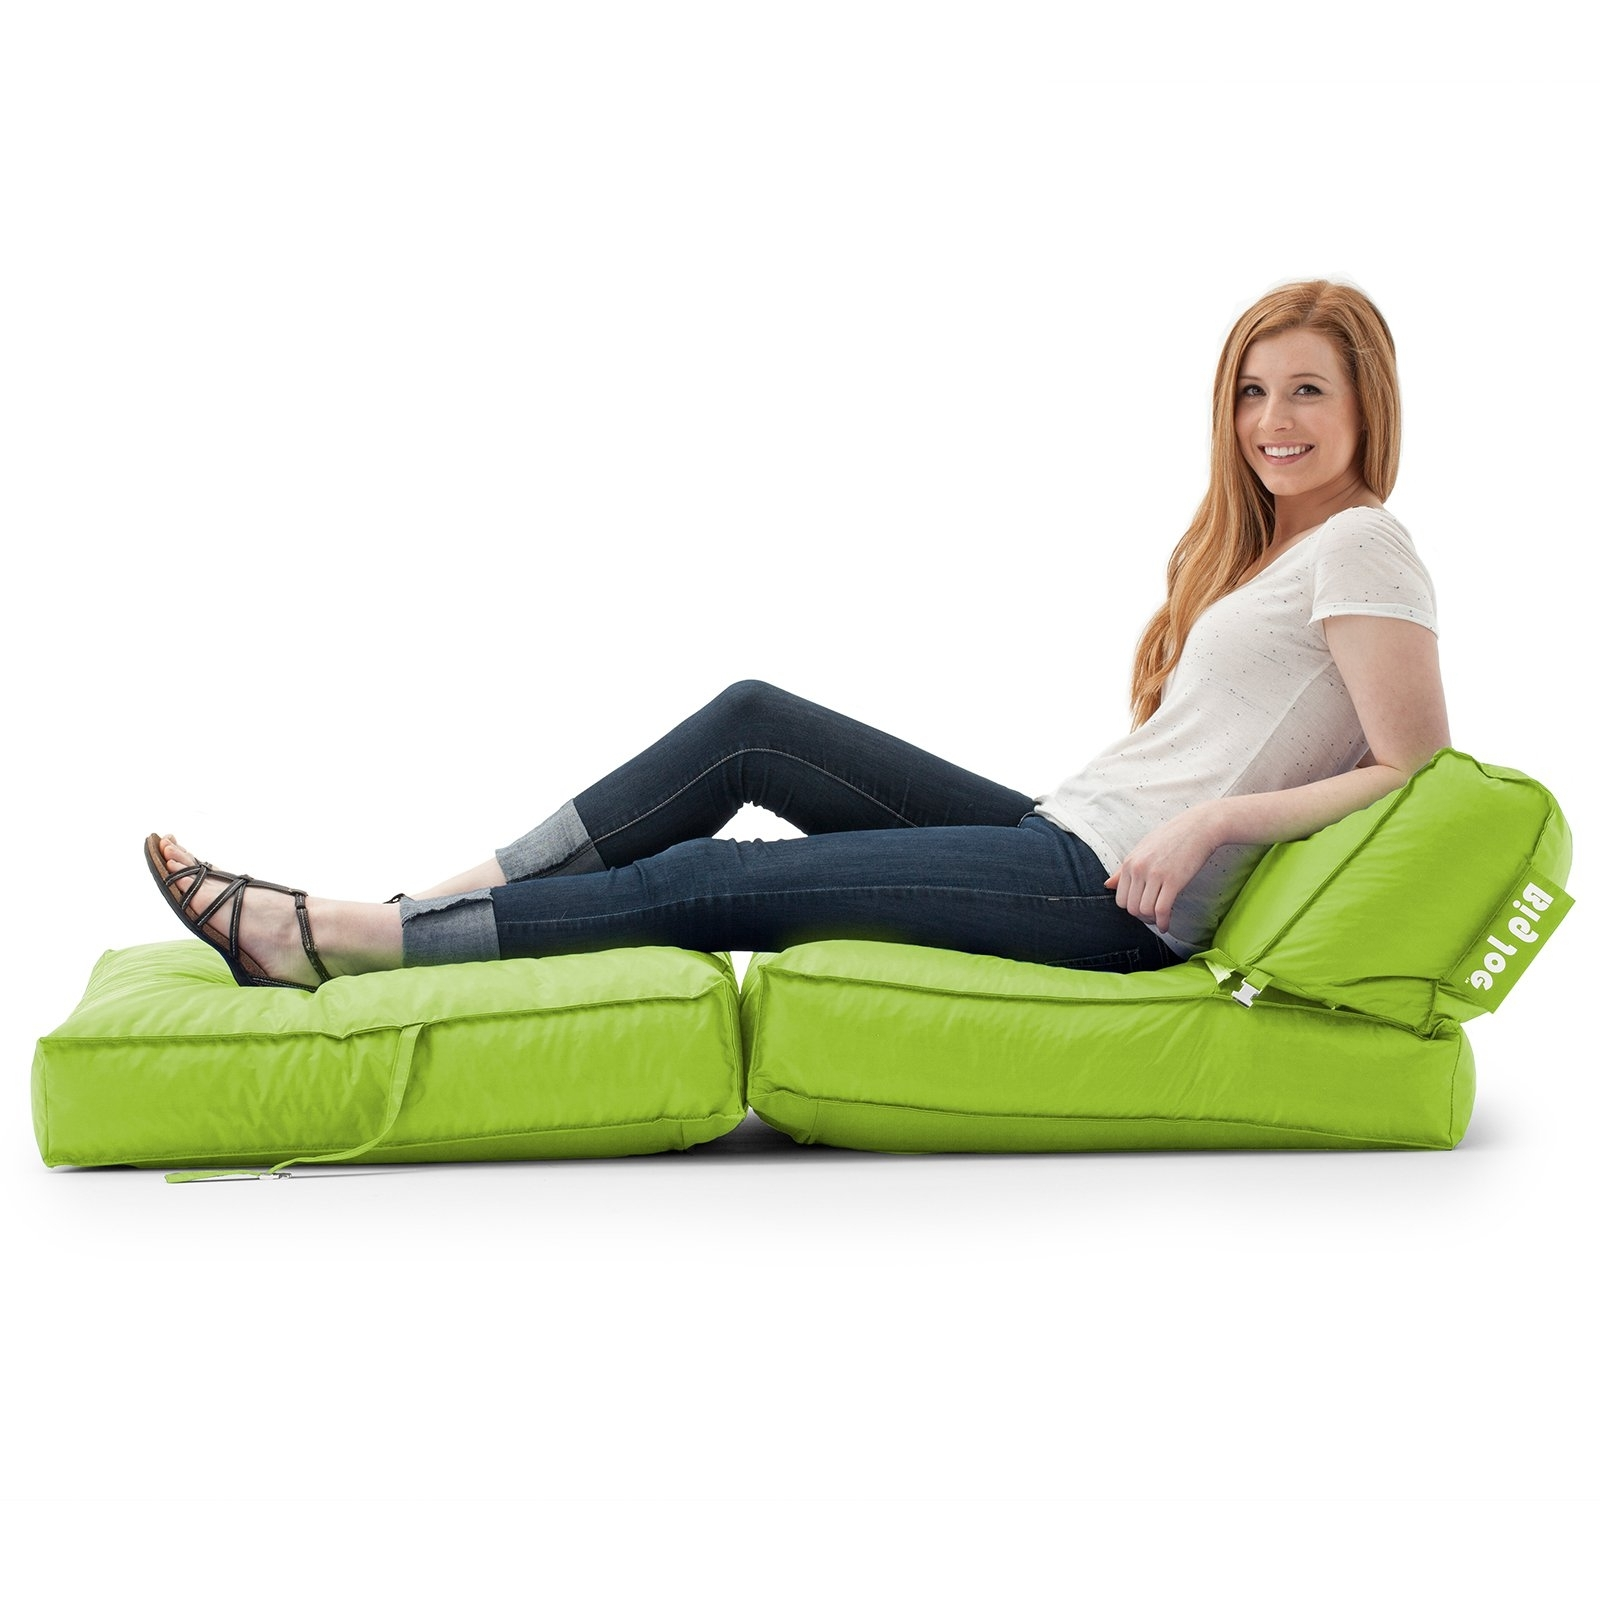 Current Bean Bag Sofas And Chairs For Big Joe Flip Lounger Bean Bag Chair – Walmart (View 17 of 20)